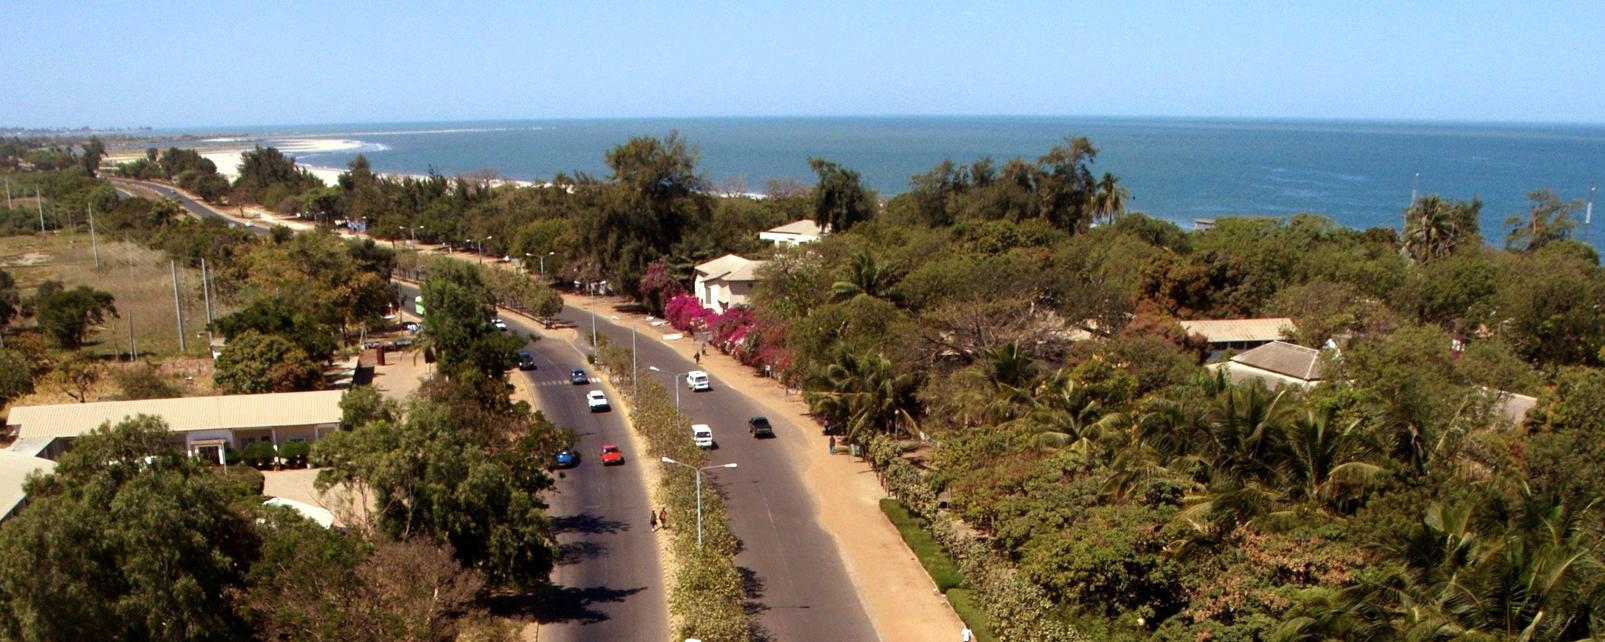 Afrique; Gambie; Banjul;